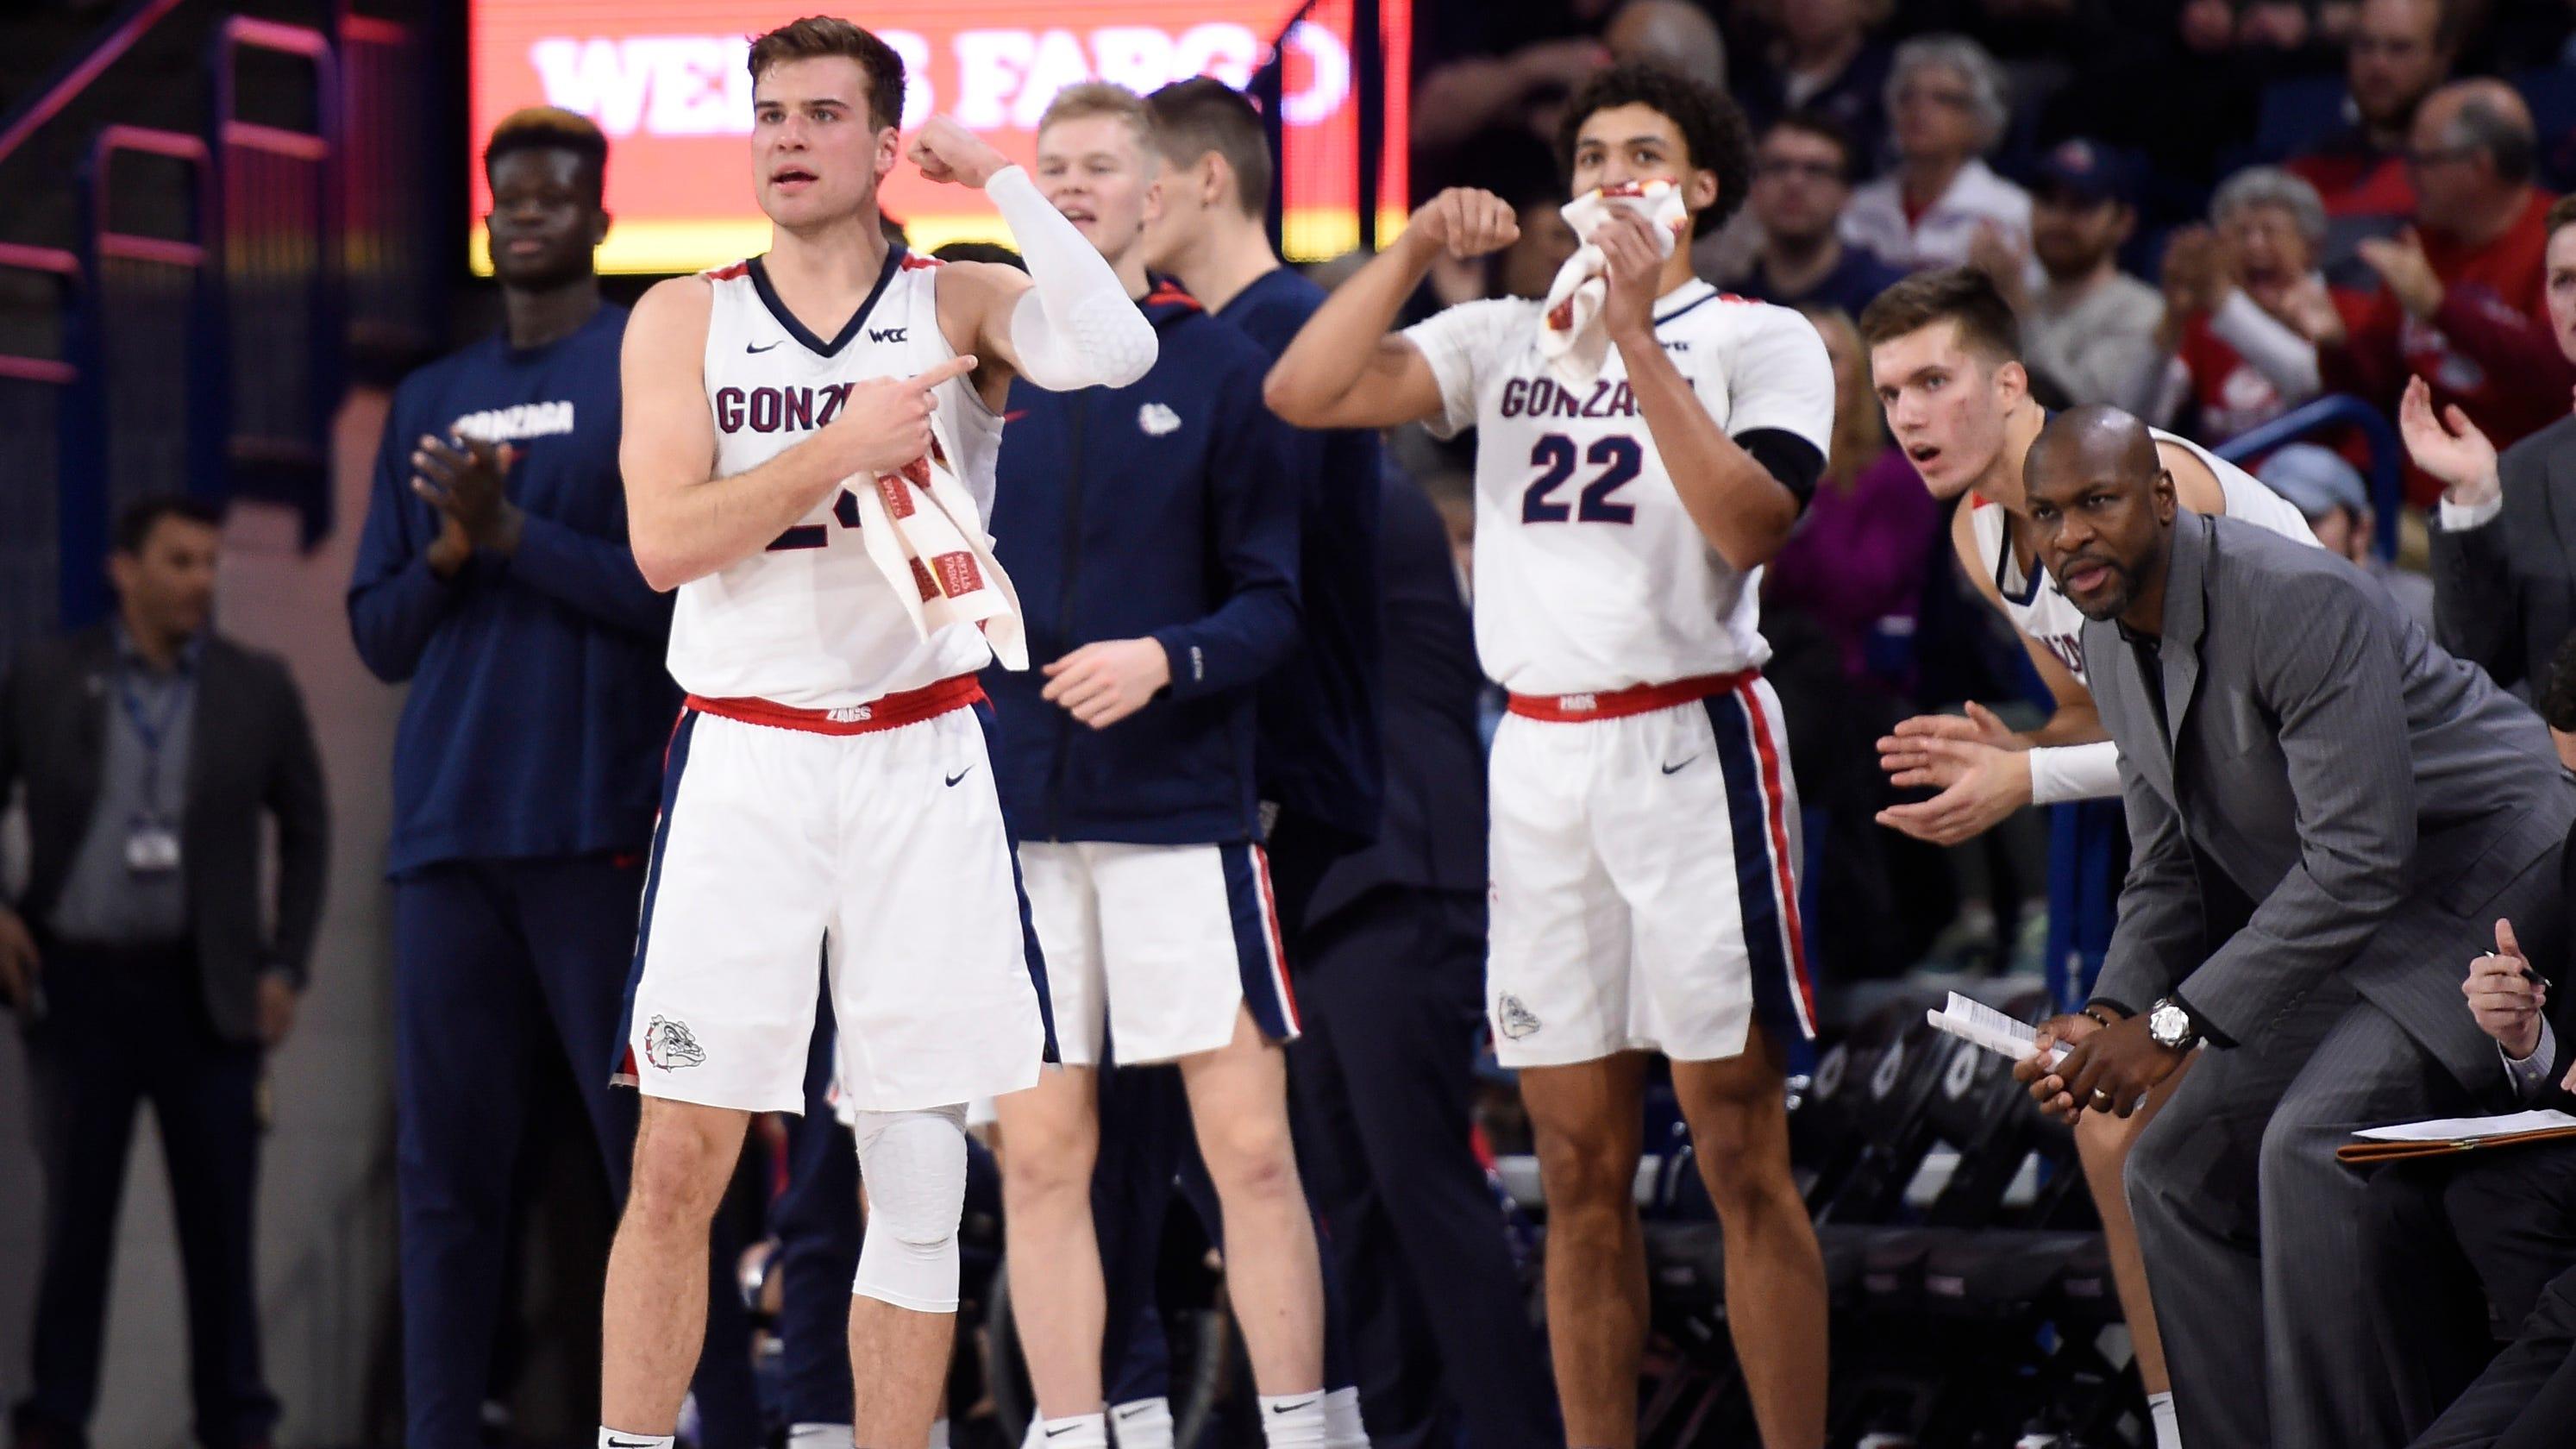 Outlooks for the Top 25 teams in the USA TODAY men's basketball preseason coaches poll